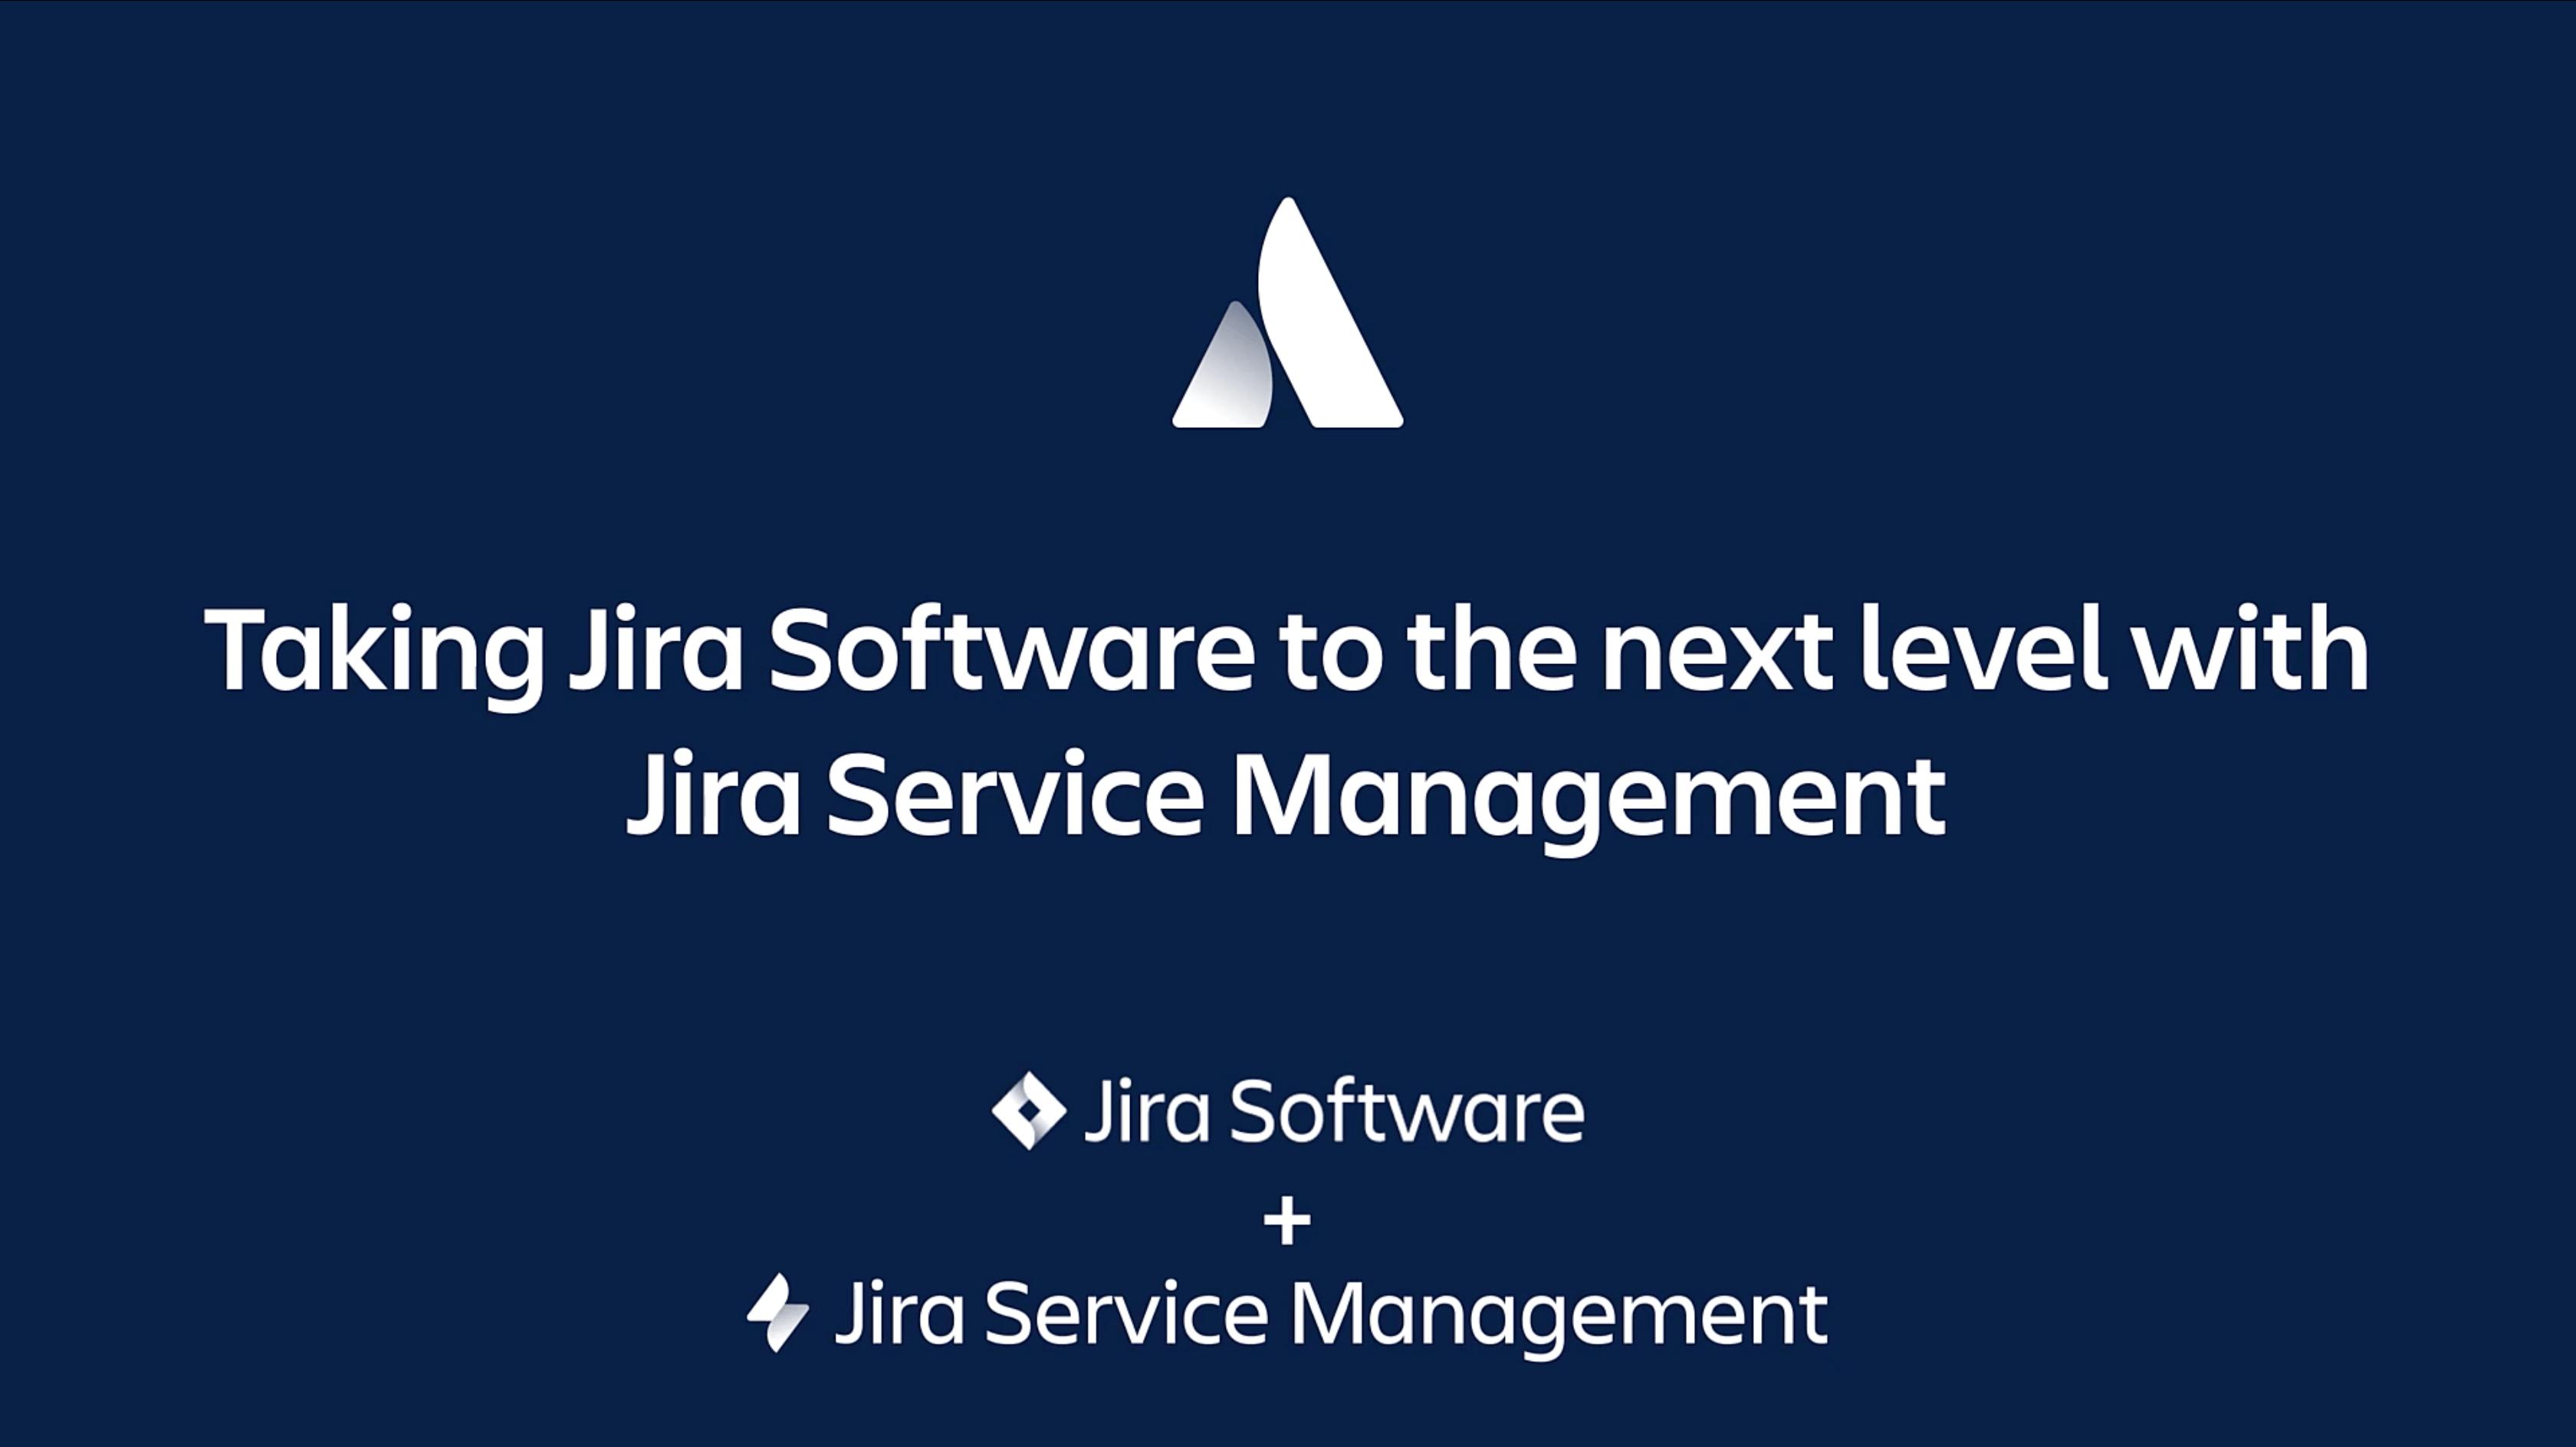 A Jira Service Management új szintre emeli a Jira Software-t